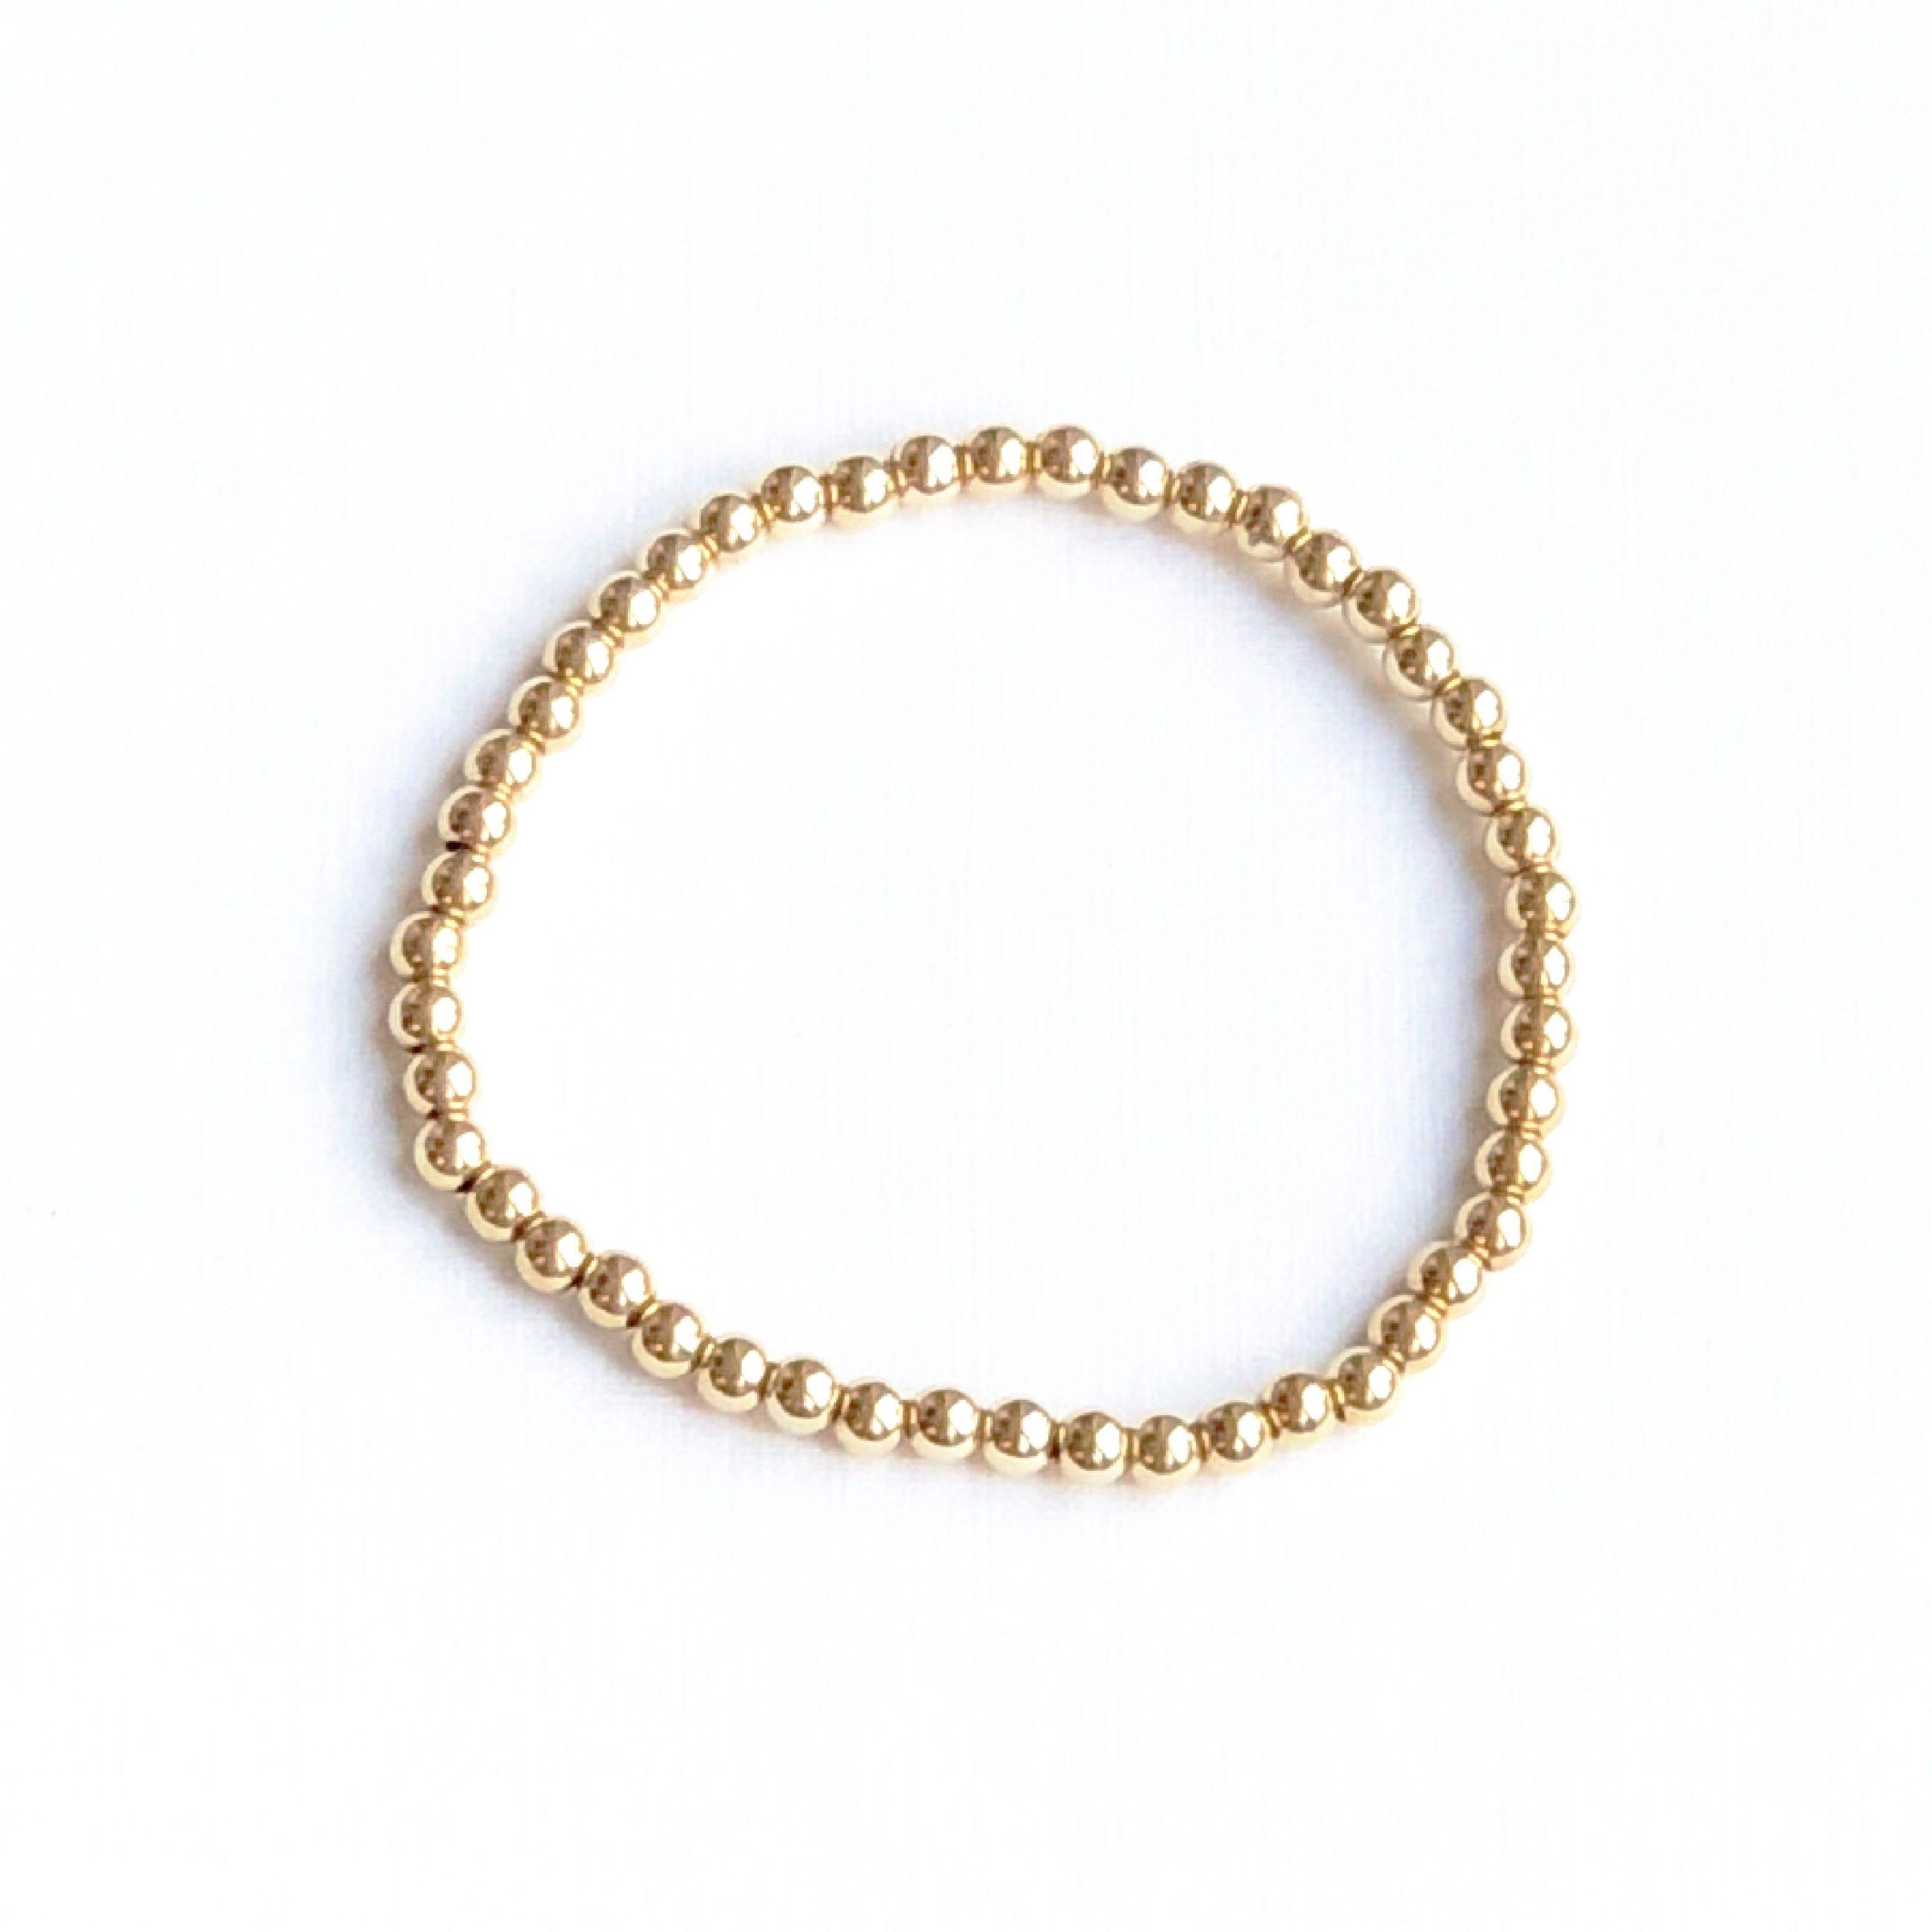 Indy & Noa goldfilled plain bracelet